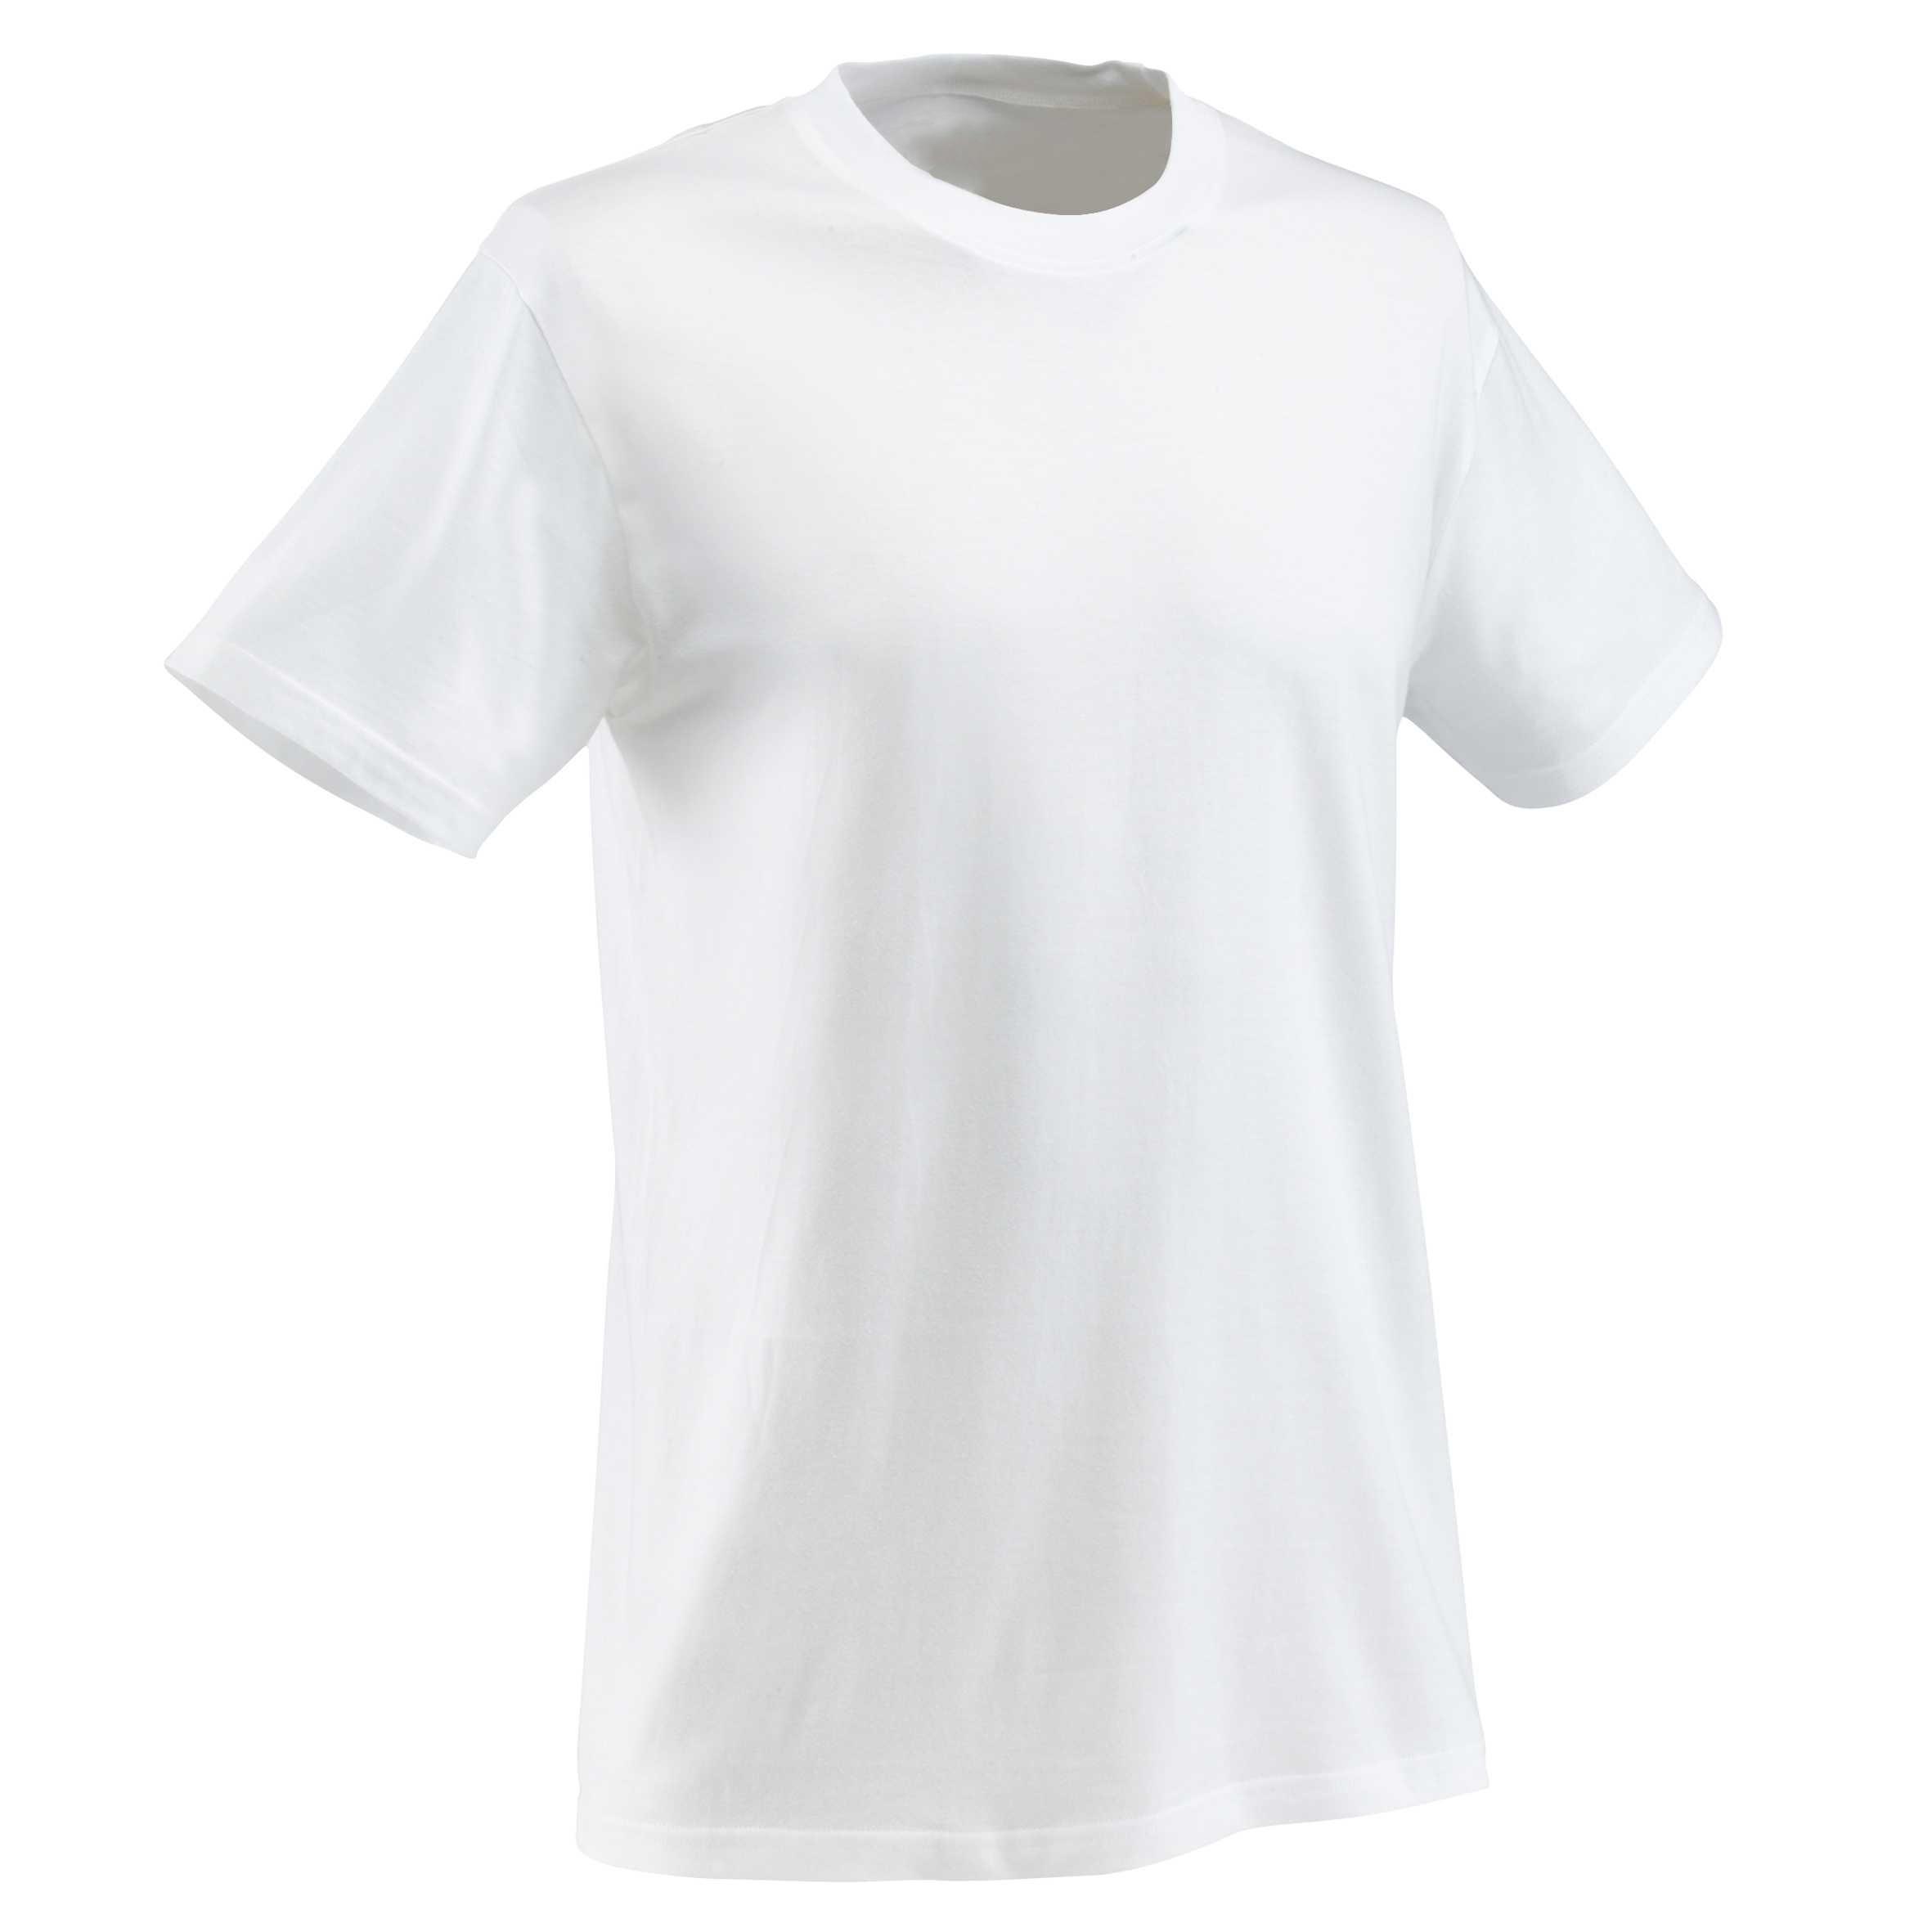 Camiseta blanca personalizable Workshop  51440517e2256